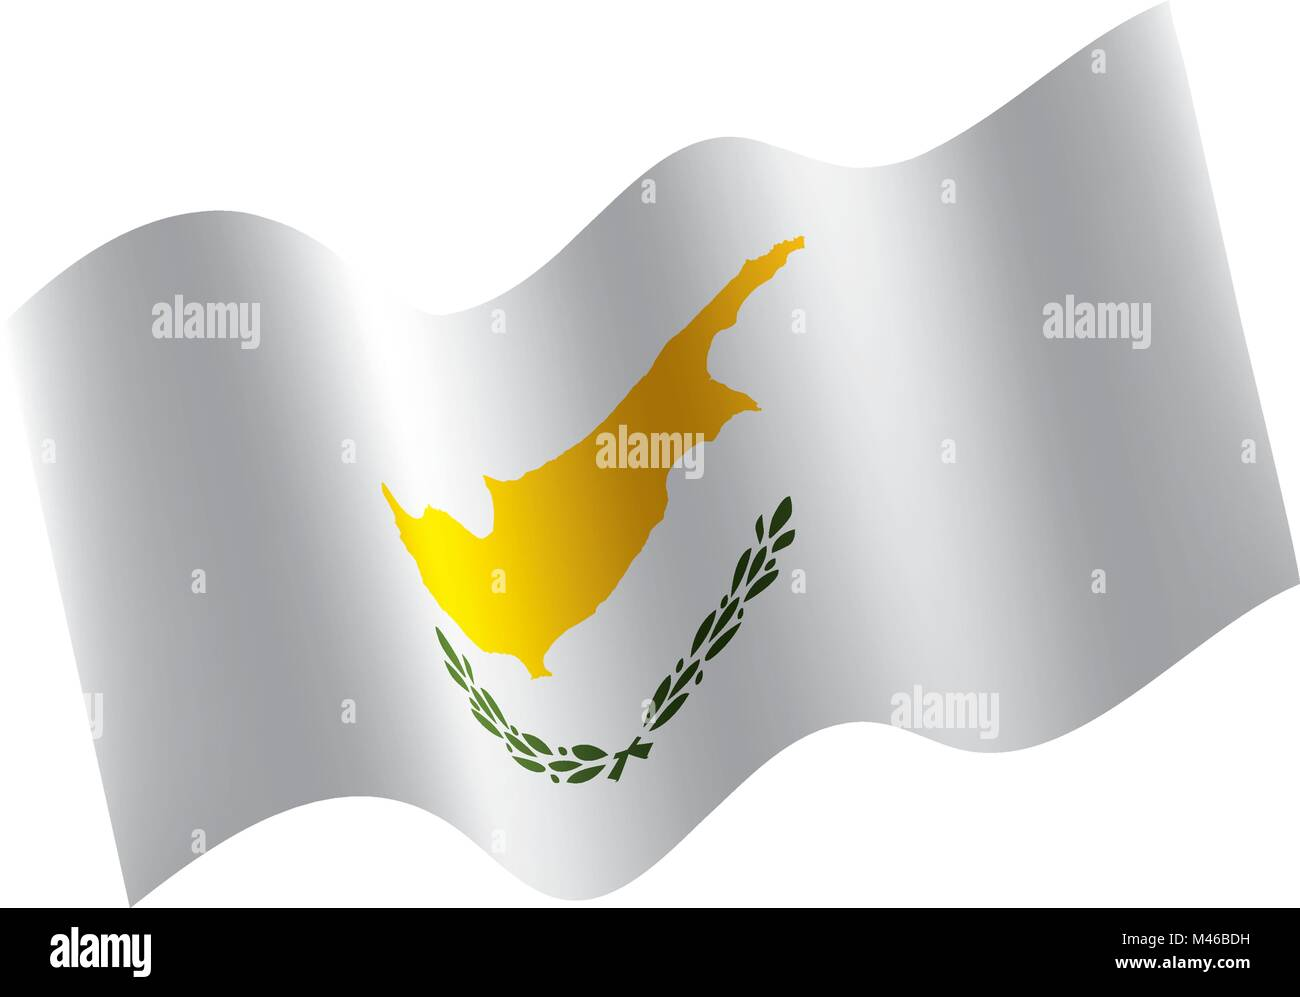 Cyprus flag, vector illustration - Stock Image